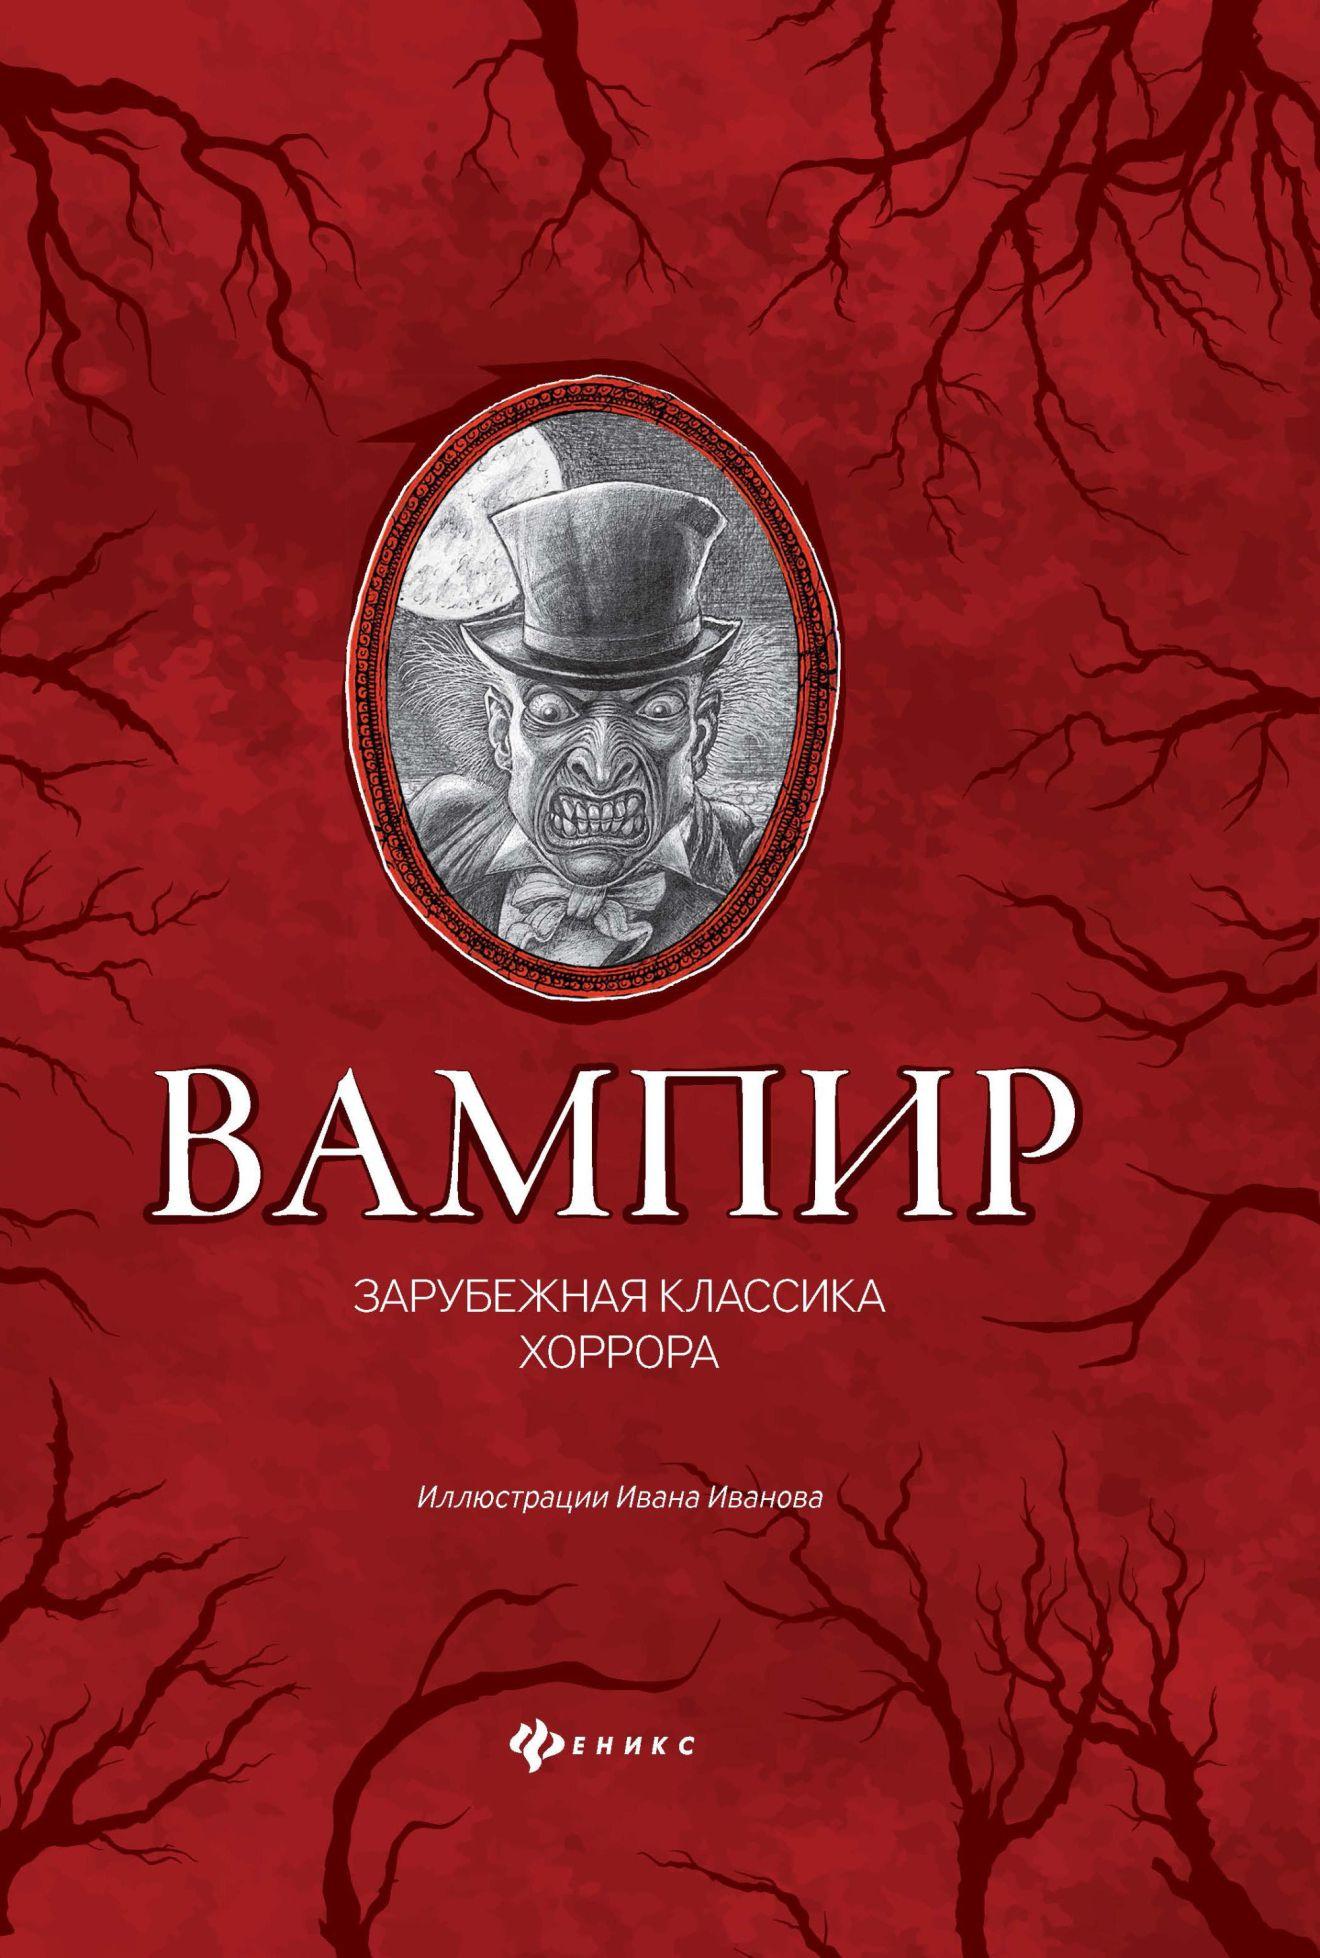 Вампир: Зарубежная классика хоррора